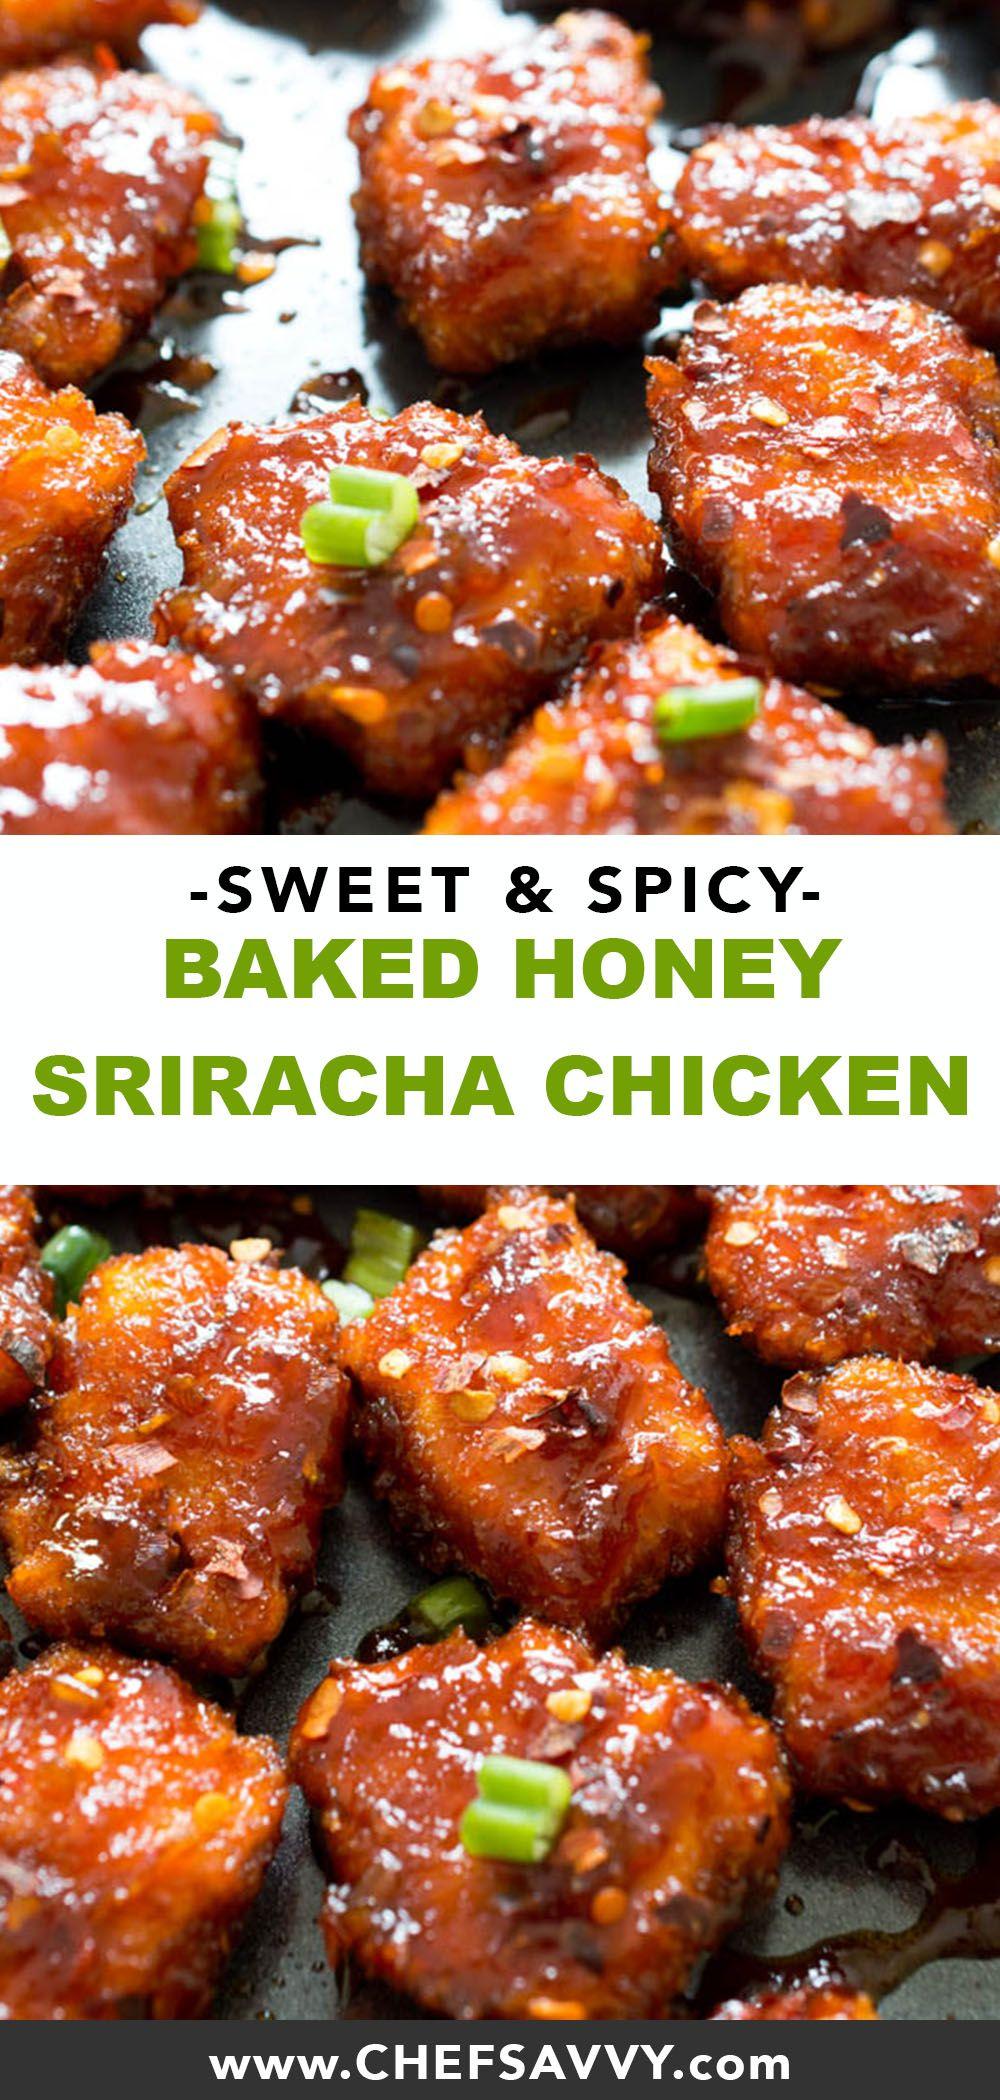 Sweet and Spicy Baked Honey Sriracha Chicken